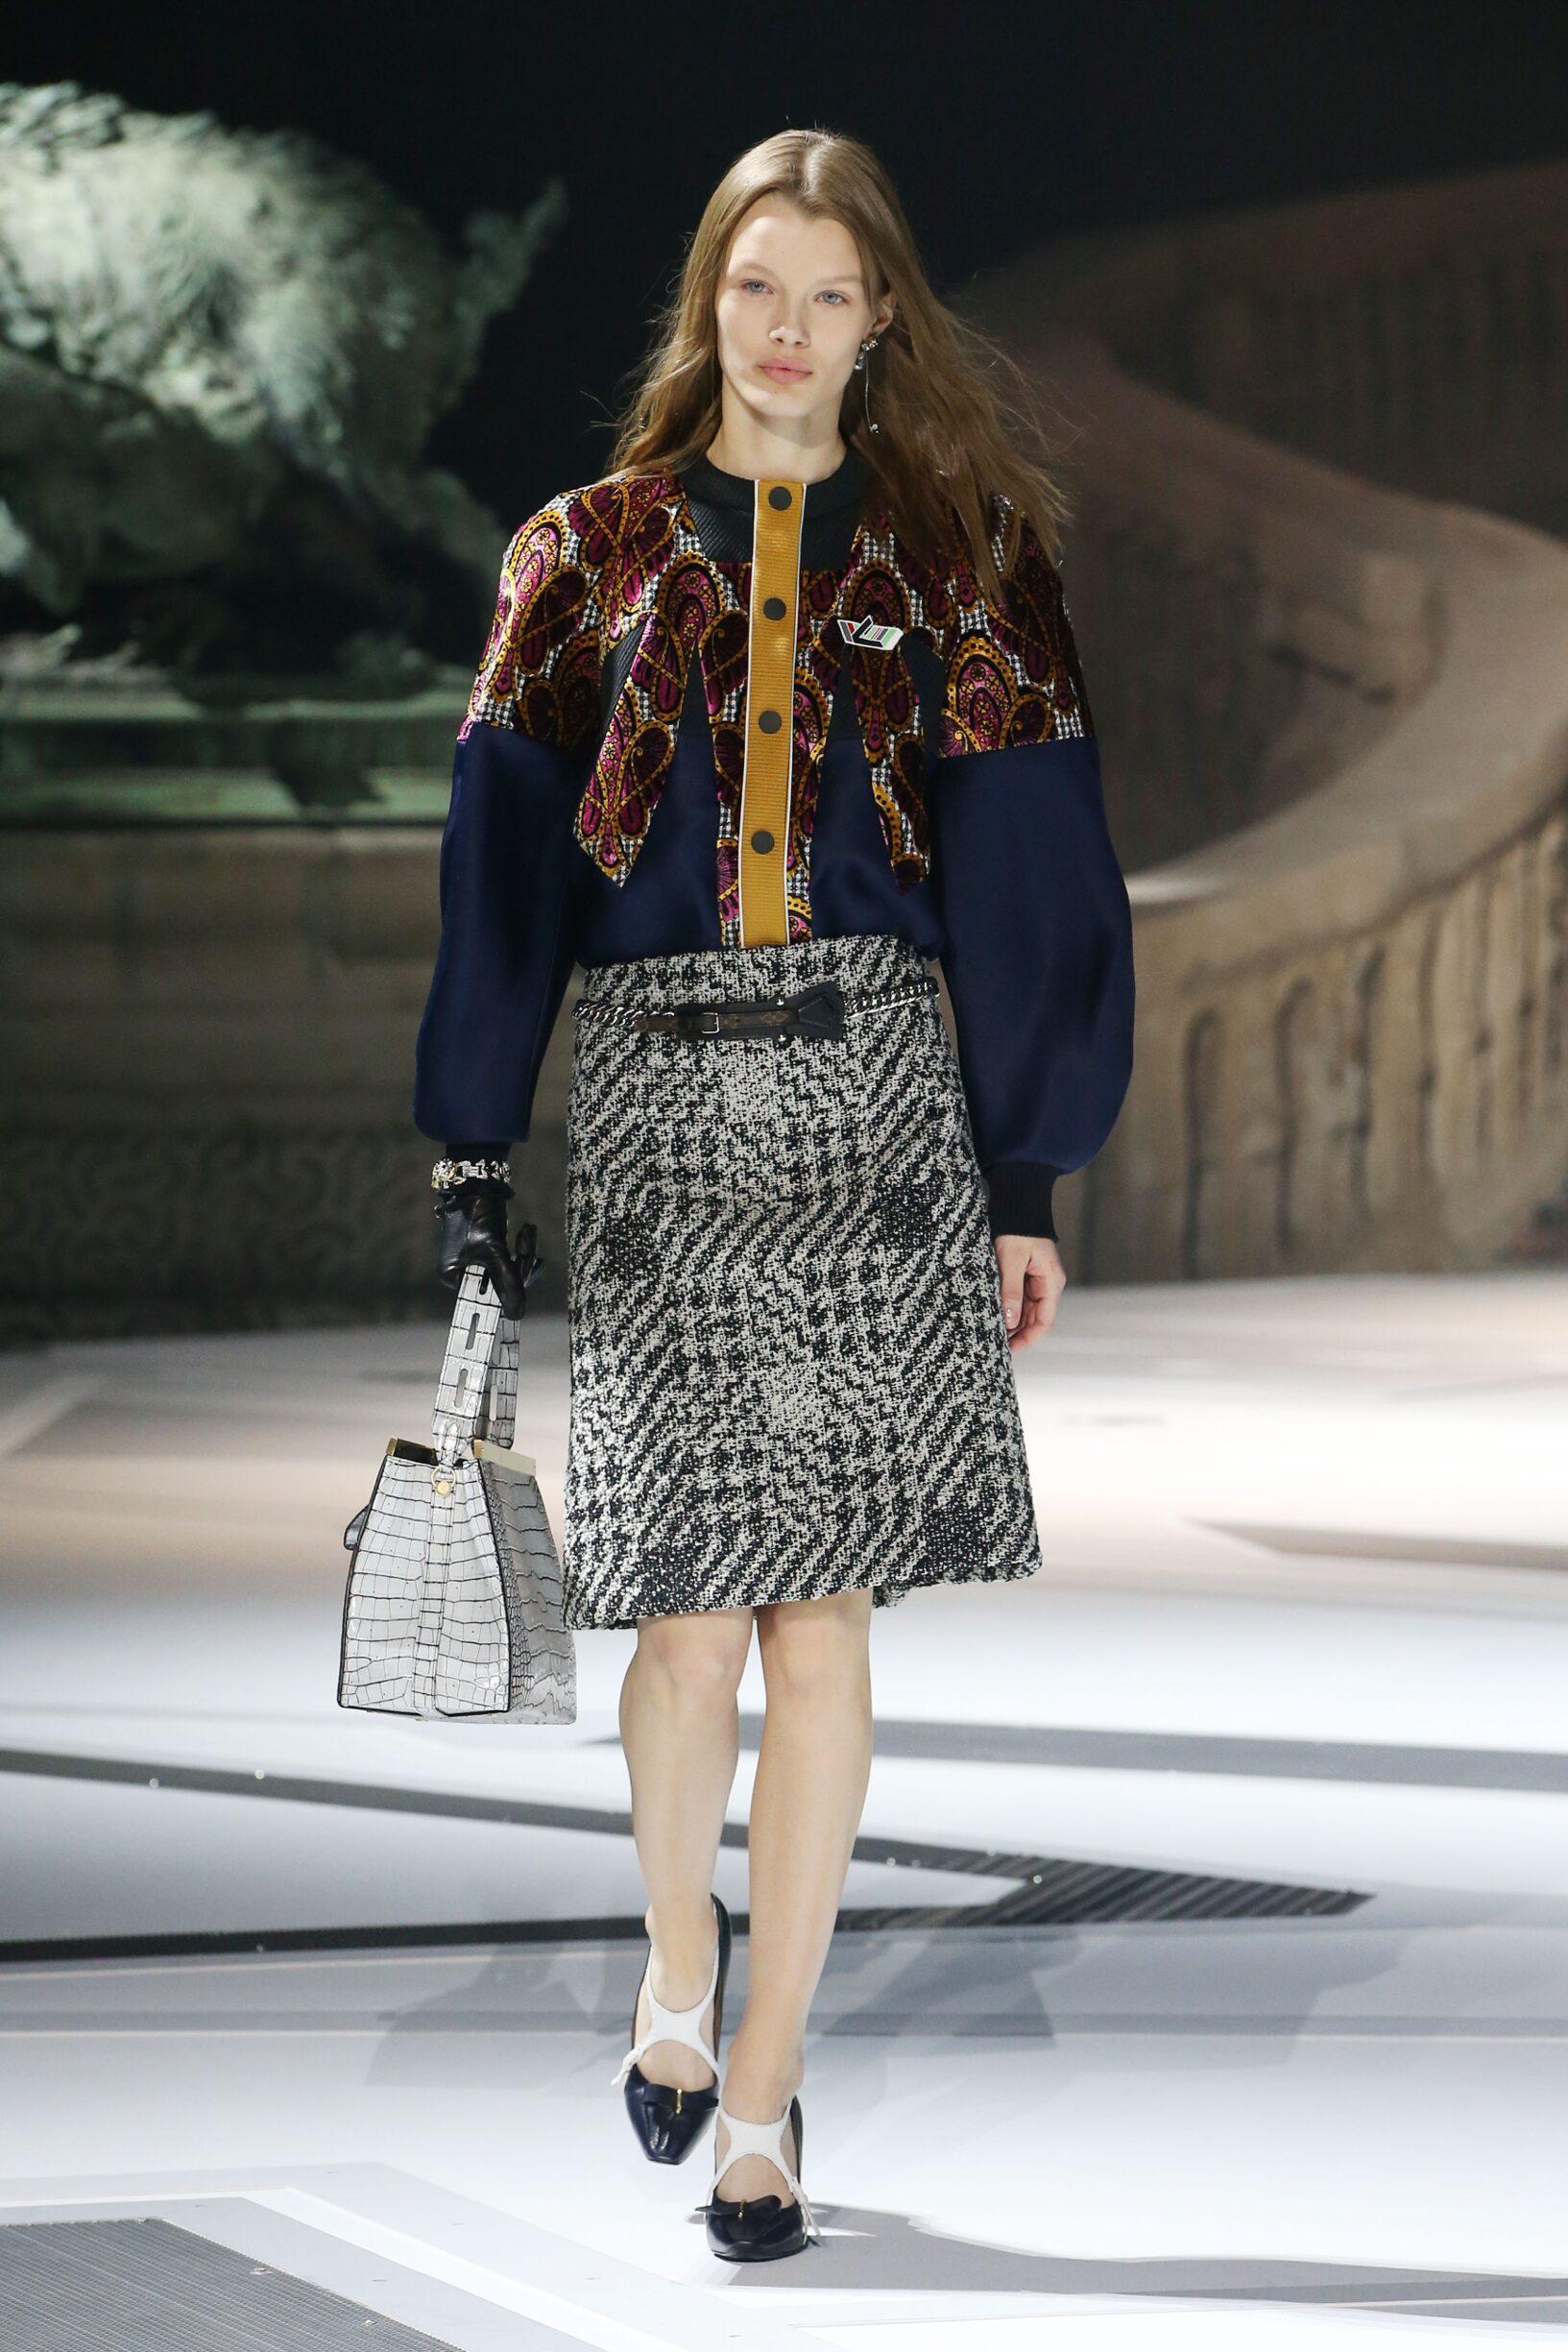 Louis Vuitton Women's Collection 2018-19